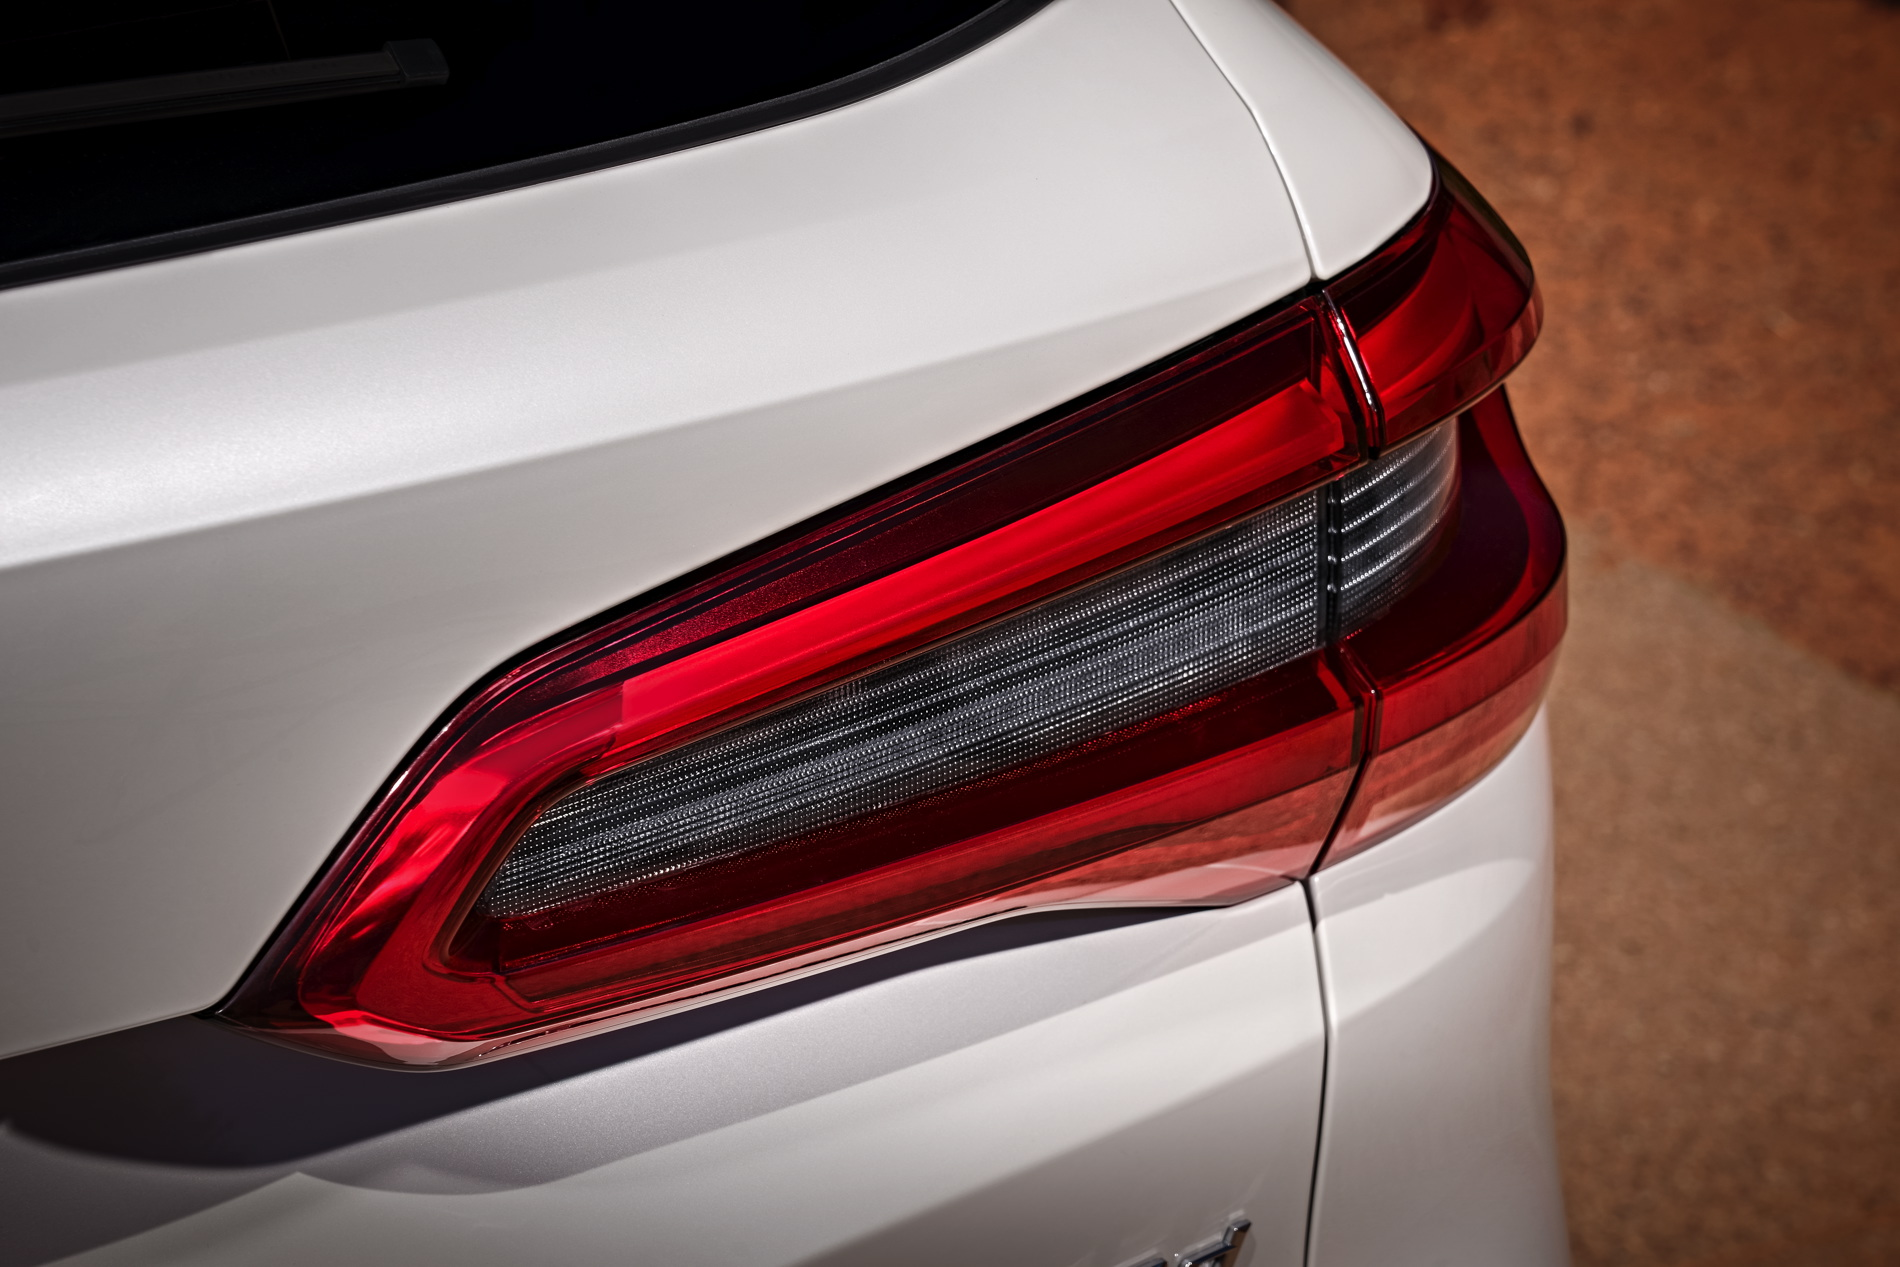 2018 BMW G05 X5 exterior 32